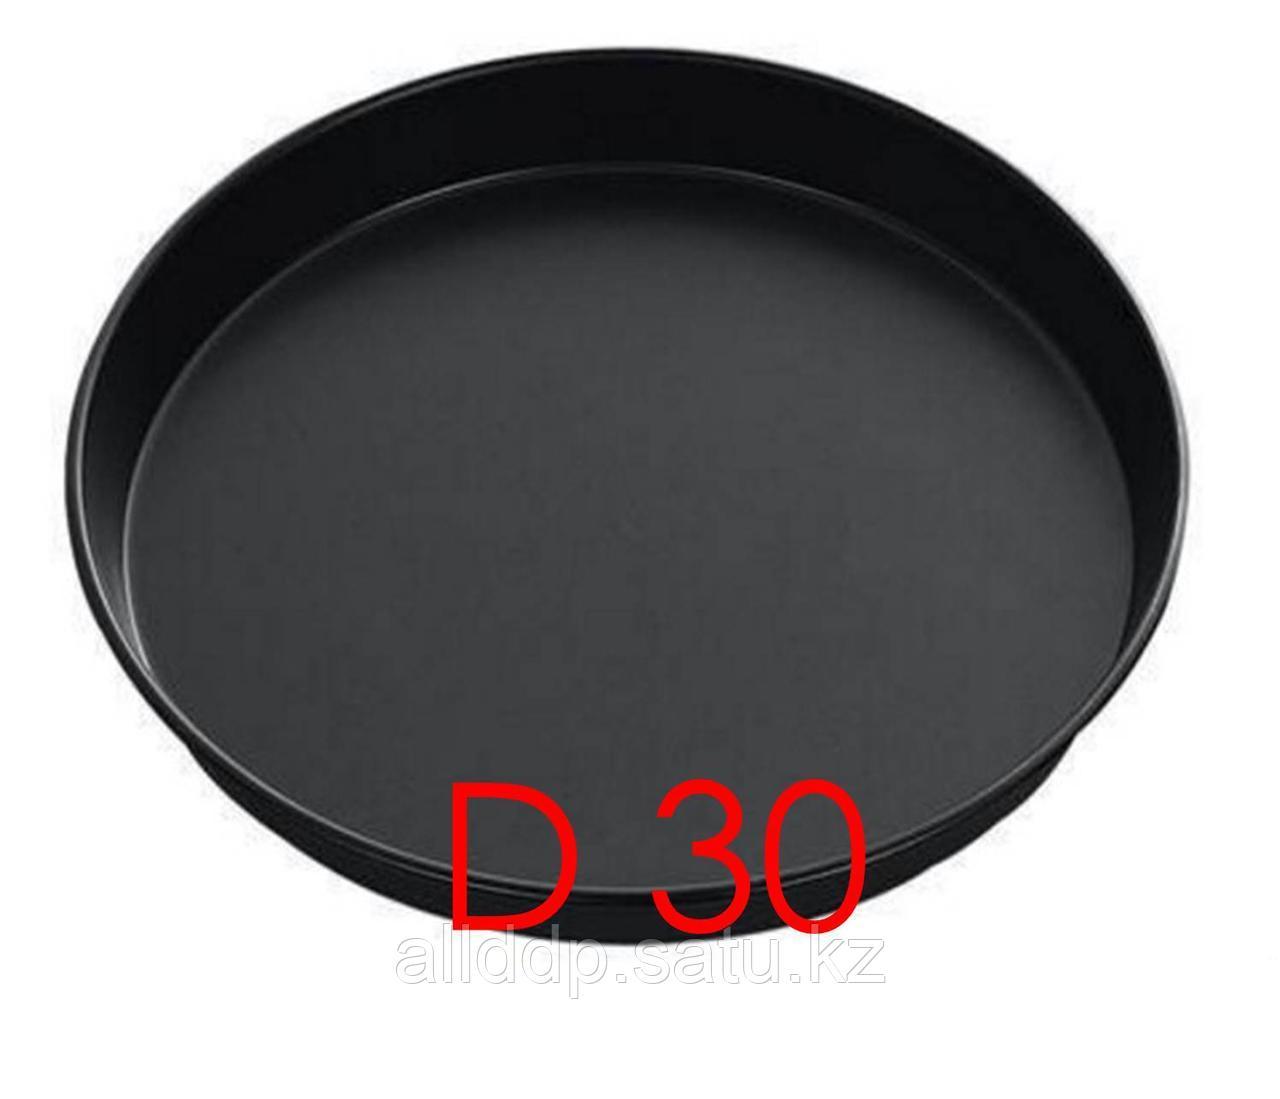 Форма для пиццы, глубокая, D 300 мм